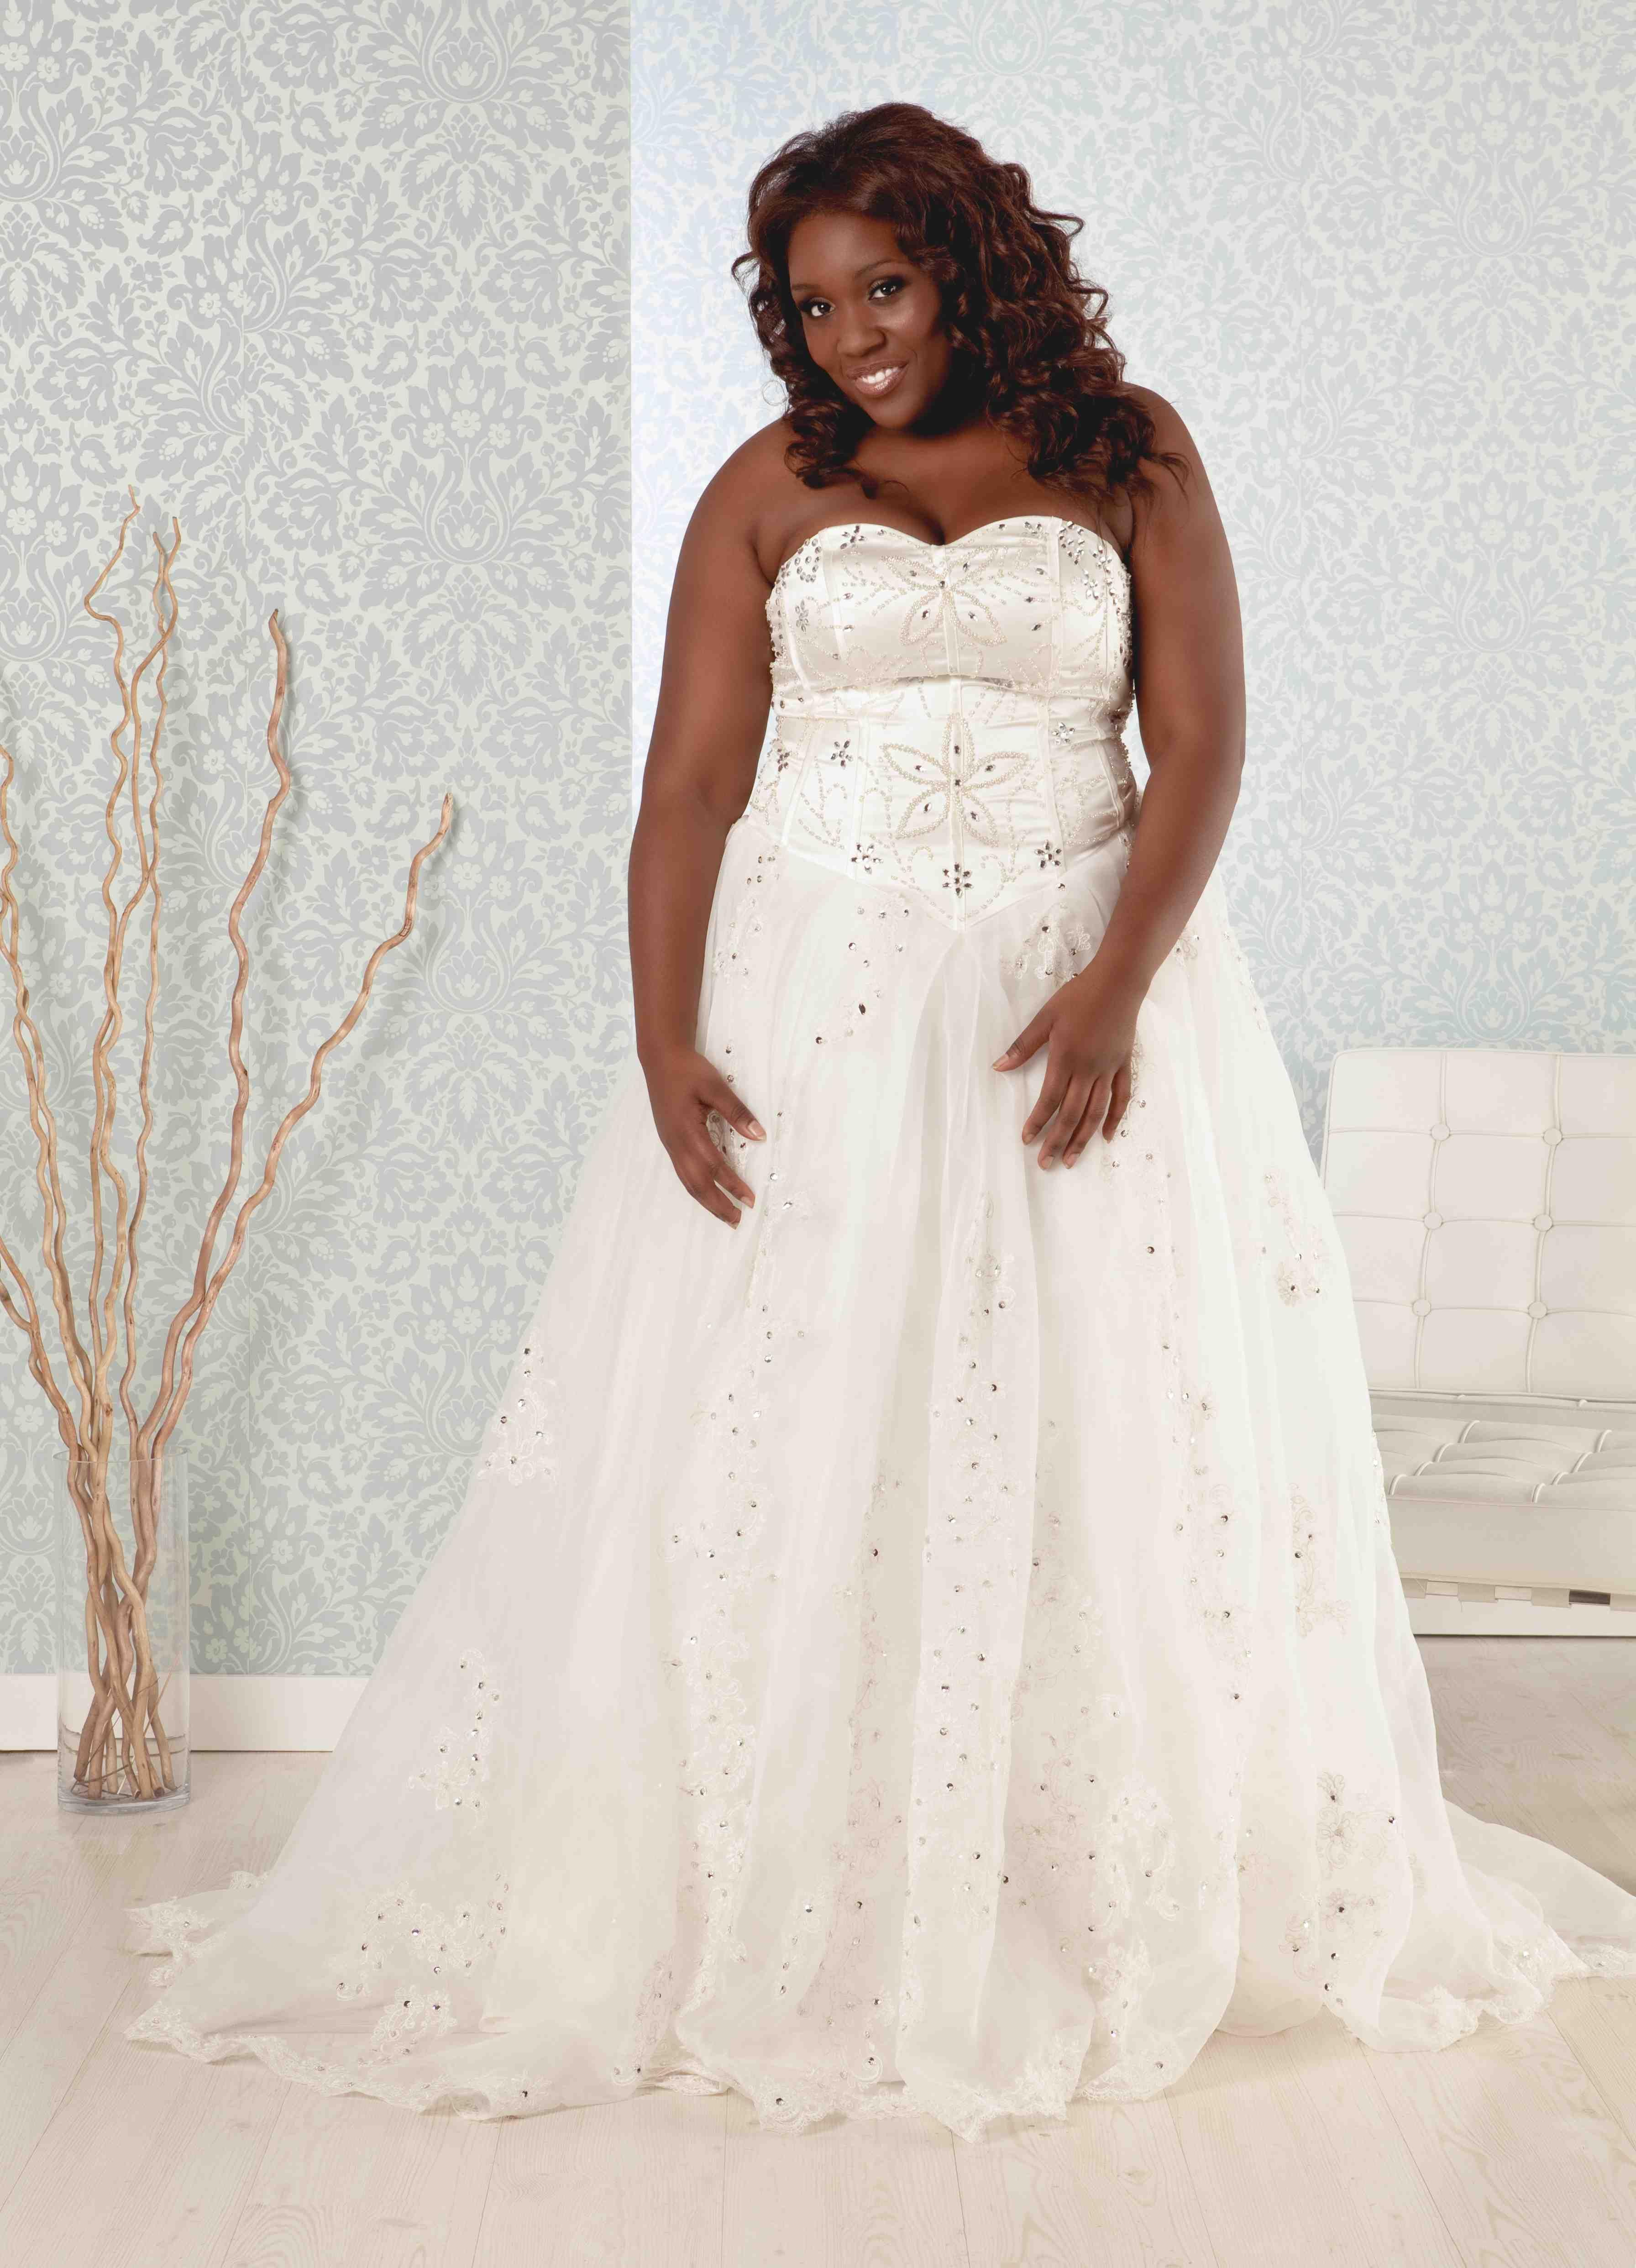 Real Size Bride Plus Size Madeline Size 10 Wedding Dress Oncewed Com Plus Size Wedding Guest Dresses Princess Wedding Dresses Ball Gowns Wedding [ 4968 x 3584 Pixel ]